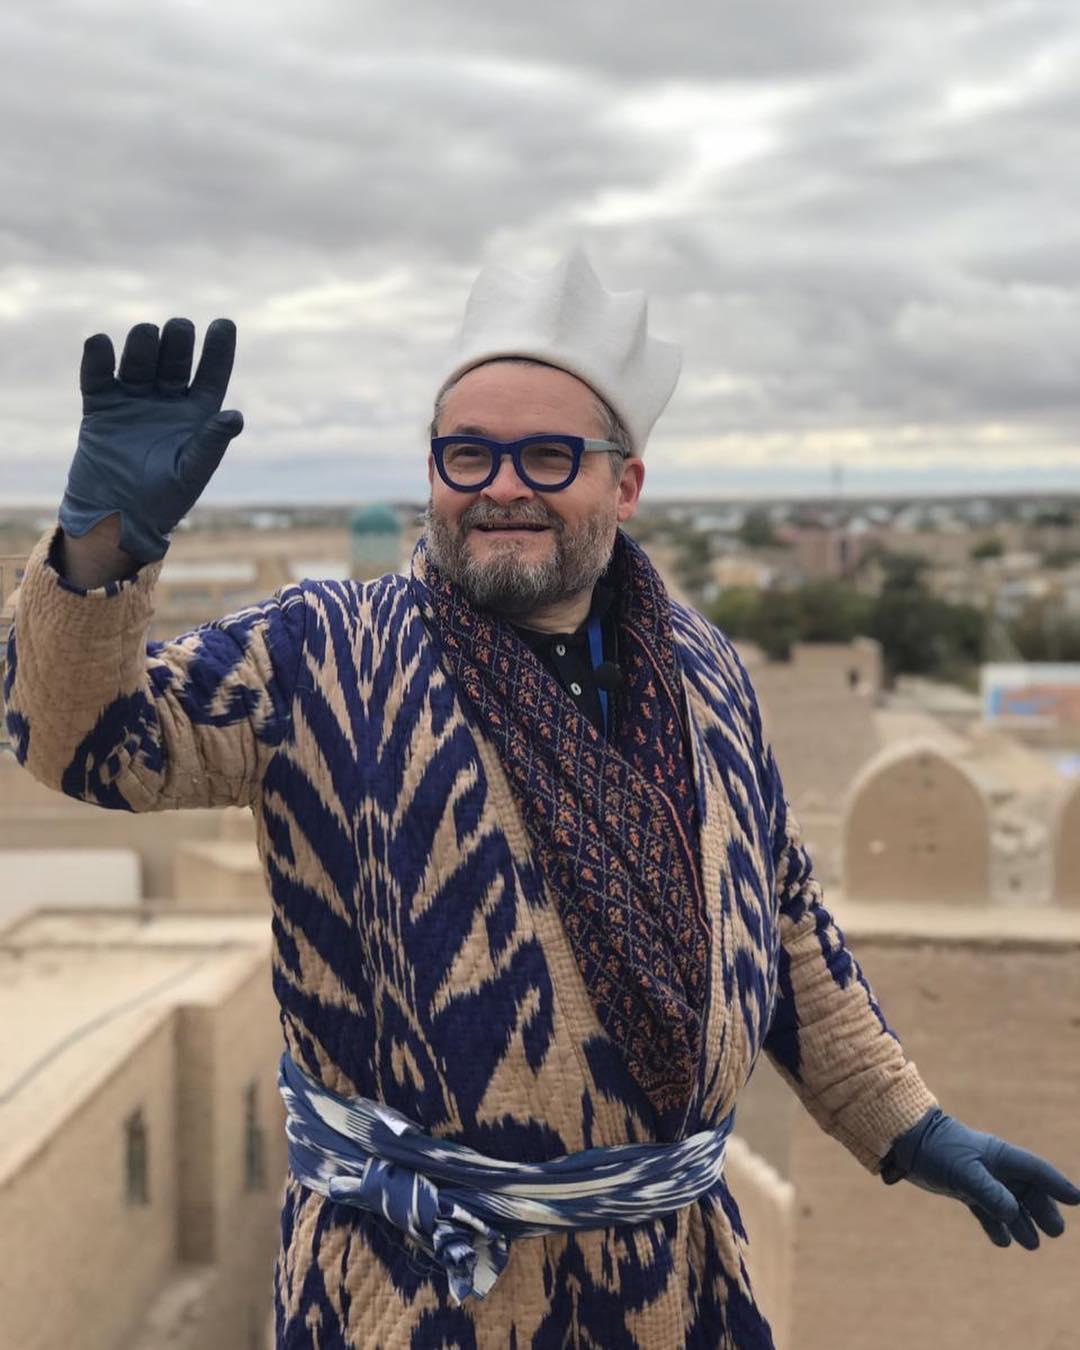 Александр Васильев выписался из Коммунарки, победив коронавирус